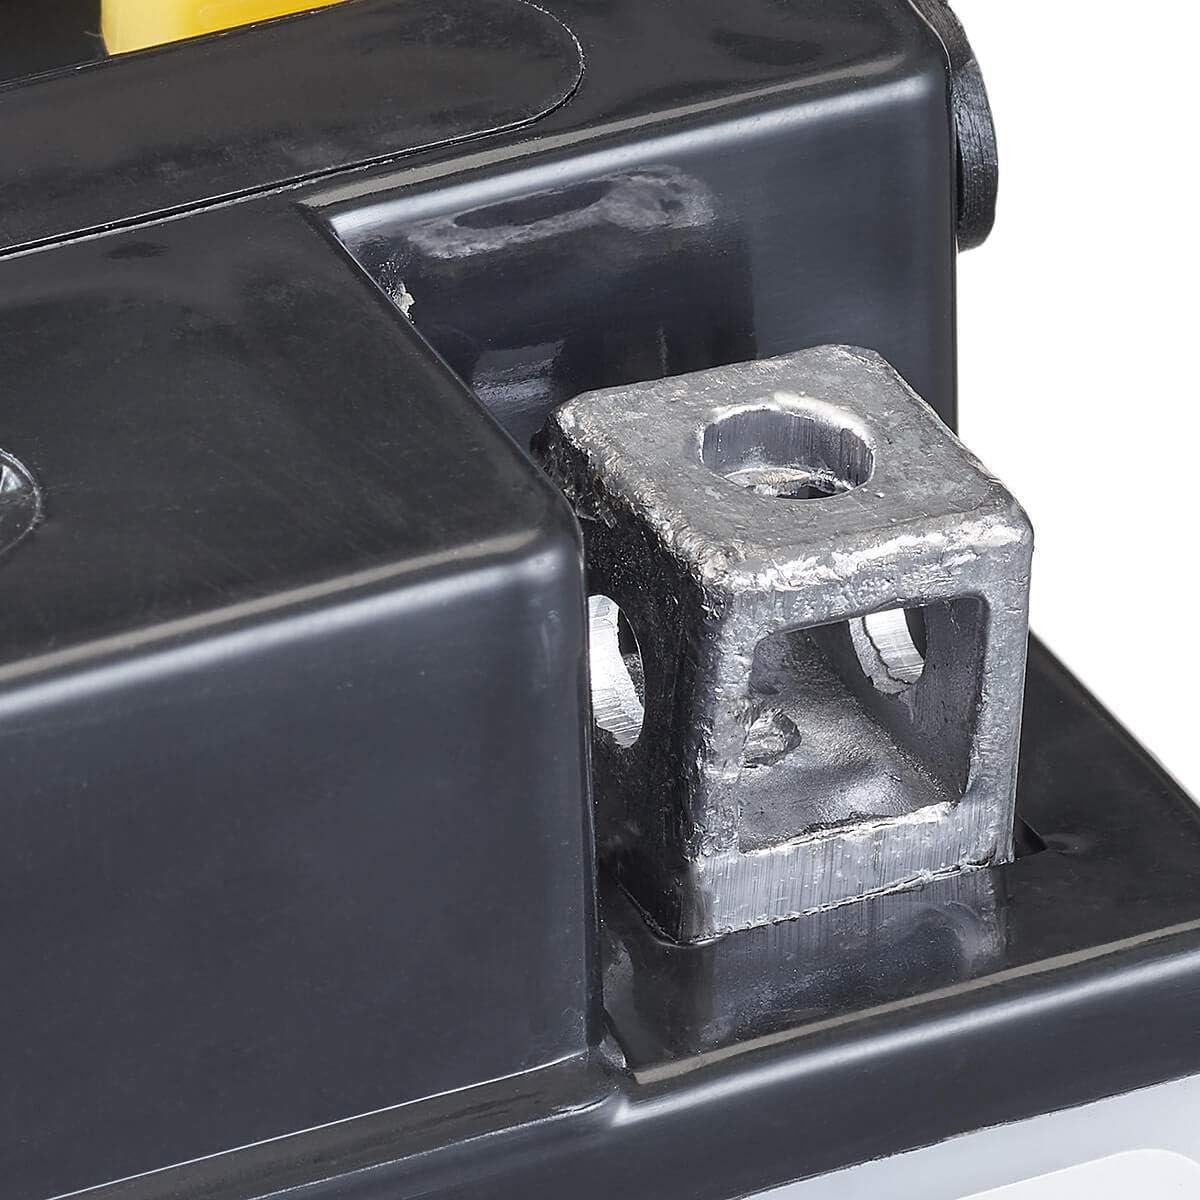 Accurat Motorrad-Batterie HYB16A-A AB S/äurepack WET Starterbatterie in Erstausr/üsterqualit/ät leistungsstark 16Ah 200A 12V Standard-Nassbatterie inkl